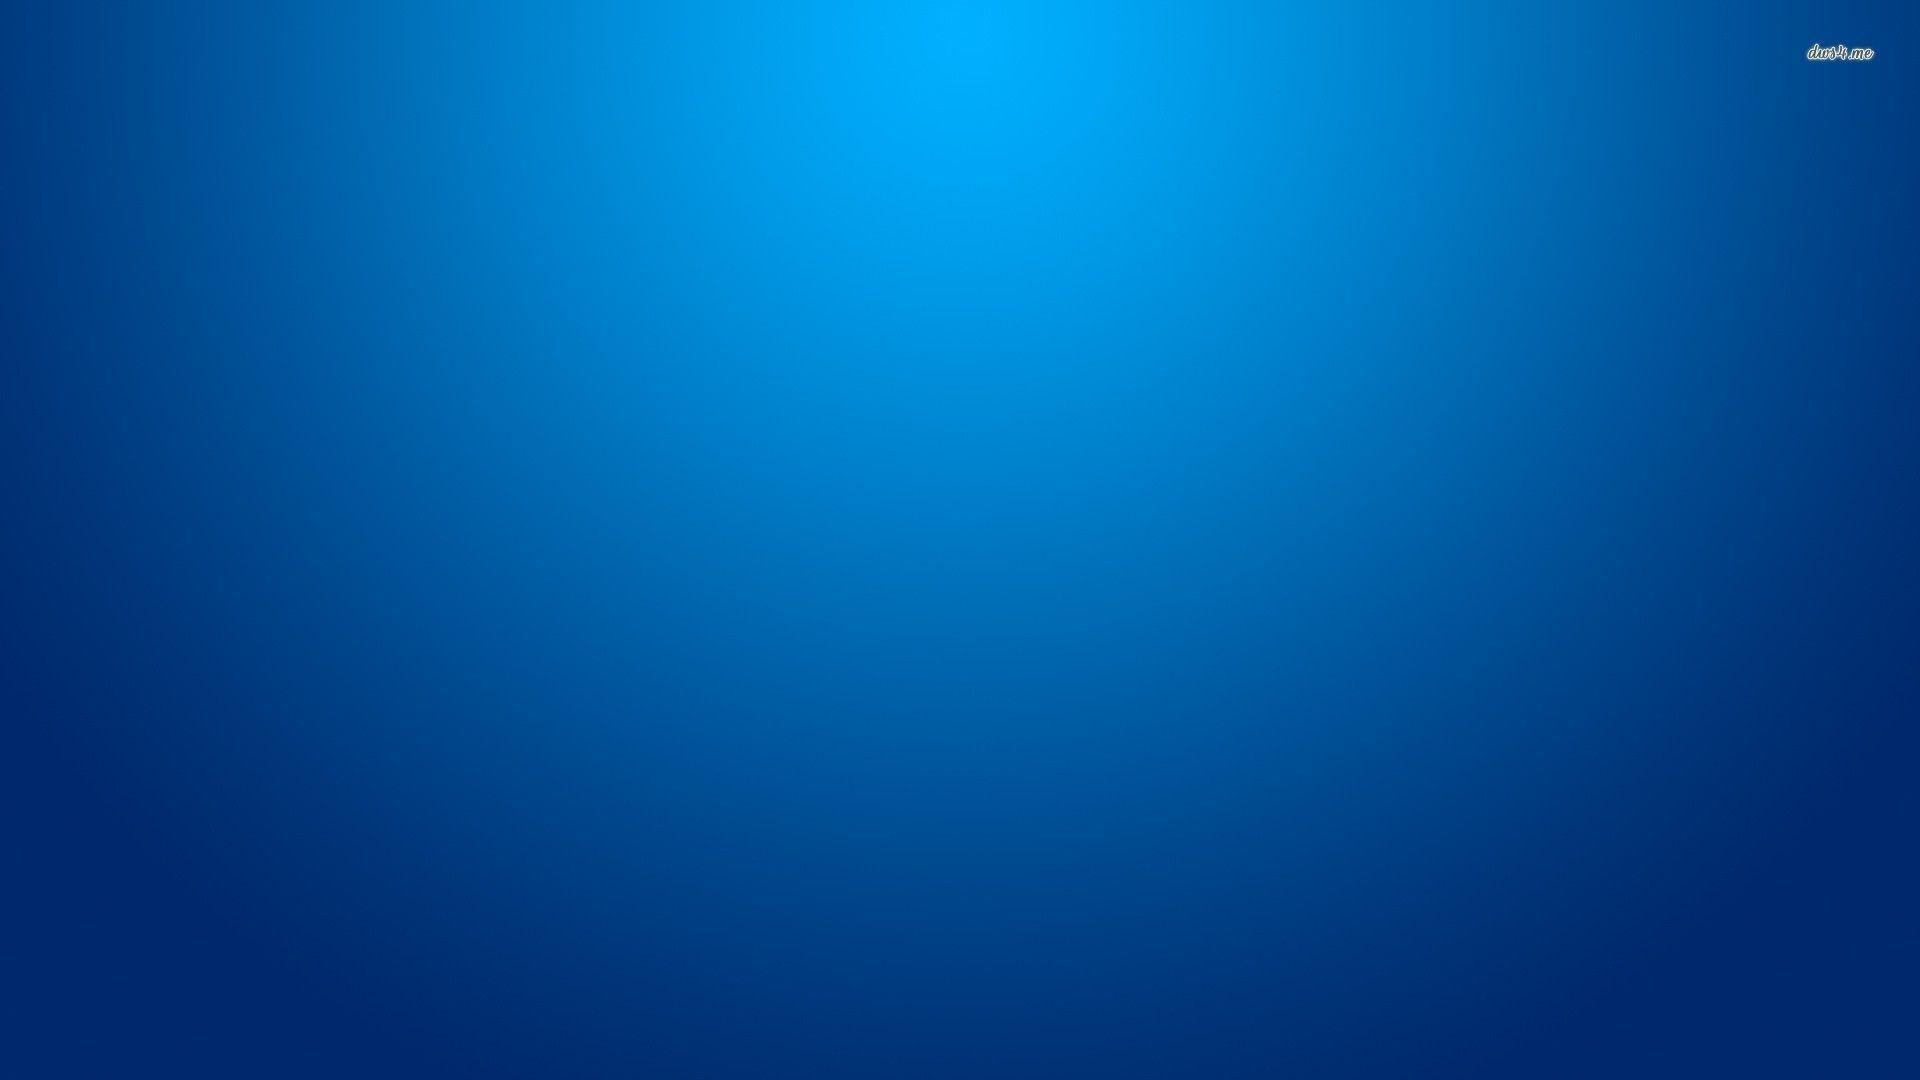 blue gradient wallpapers - wallpaper cave